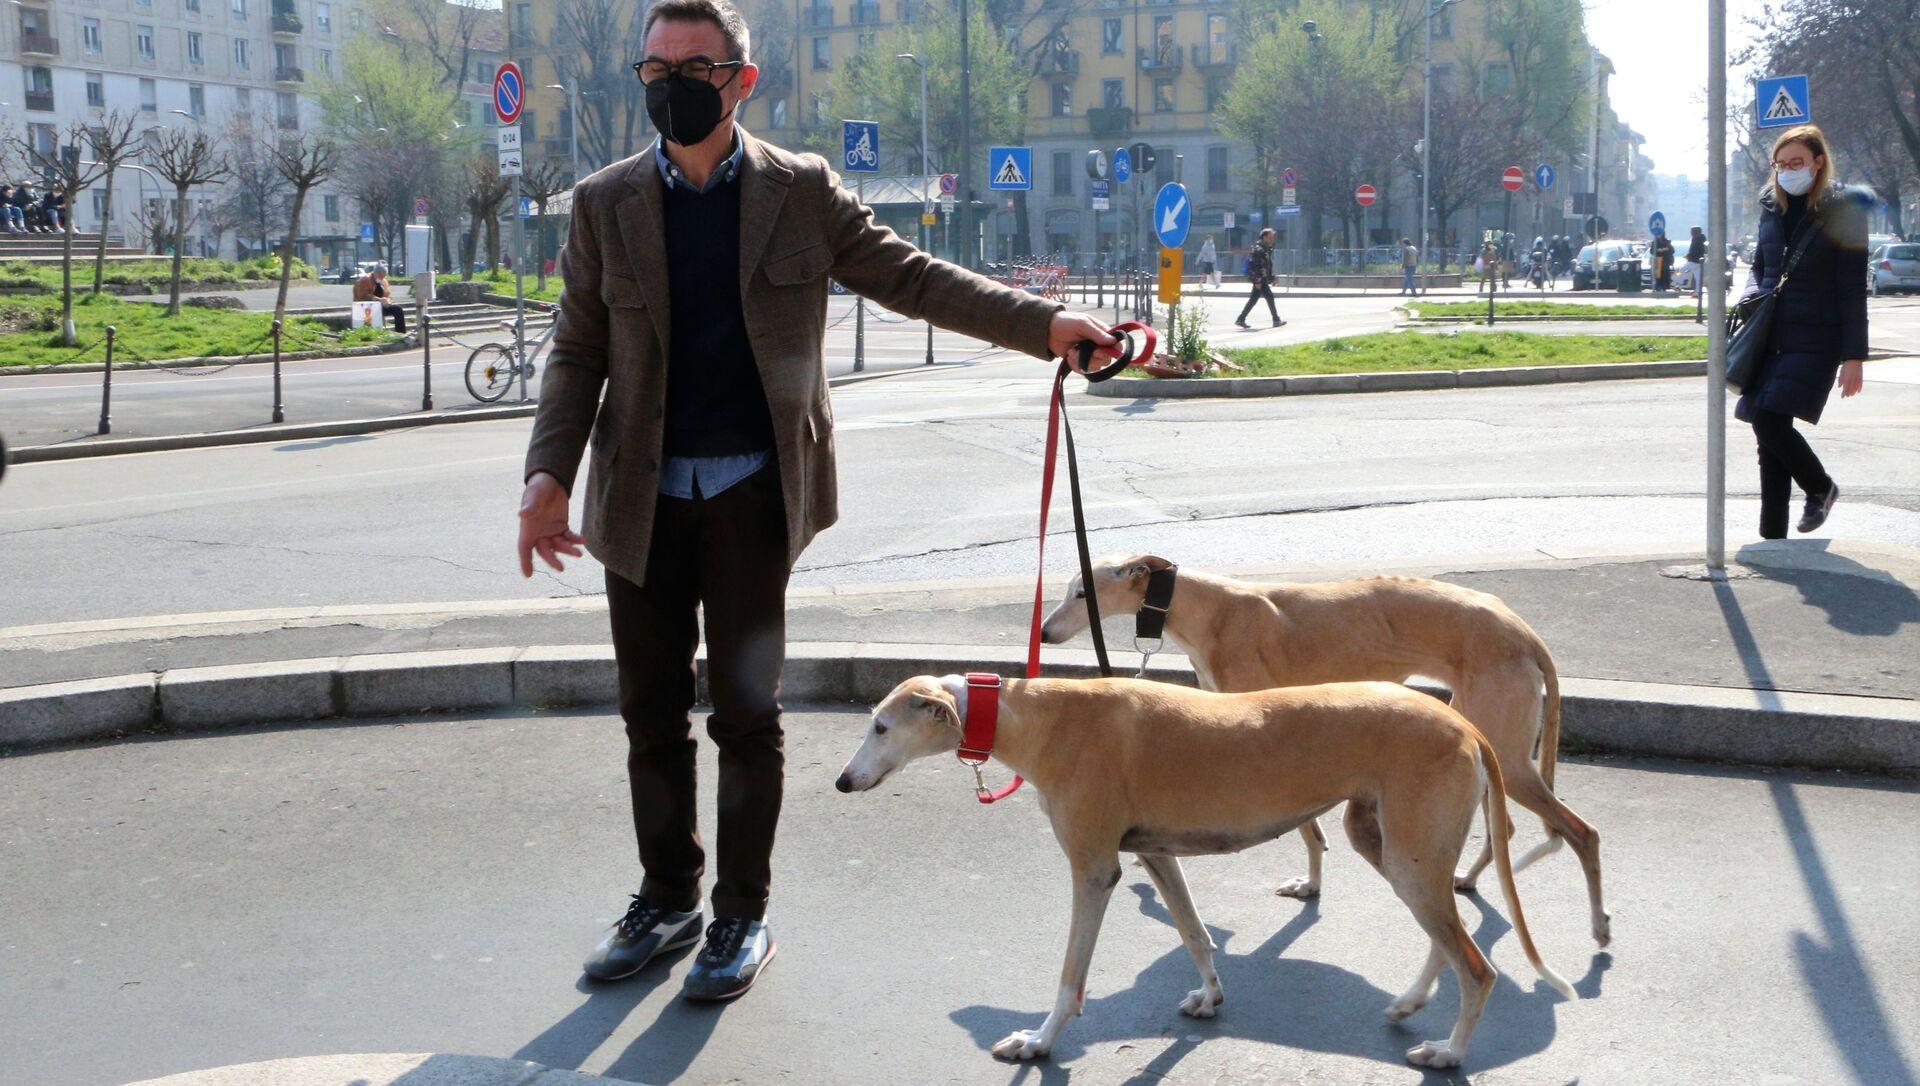 Uomo con i cani a Milano - Sputnik Italia, 1920, 05.04.2021